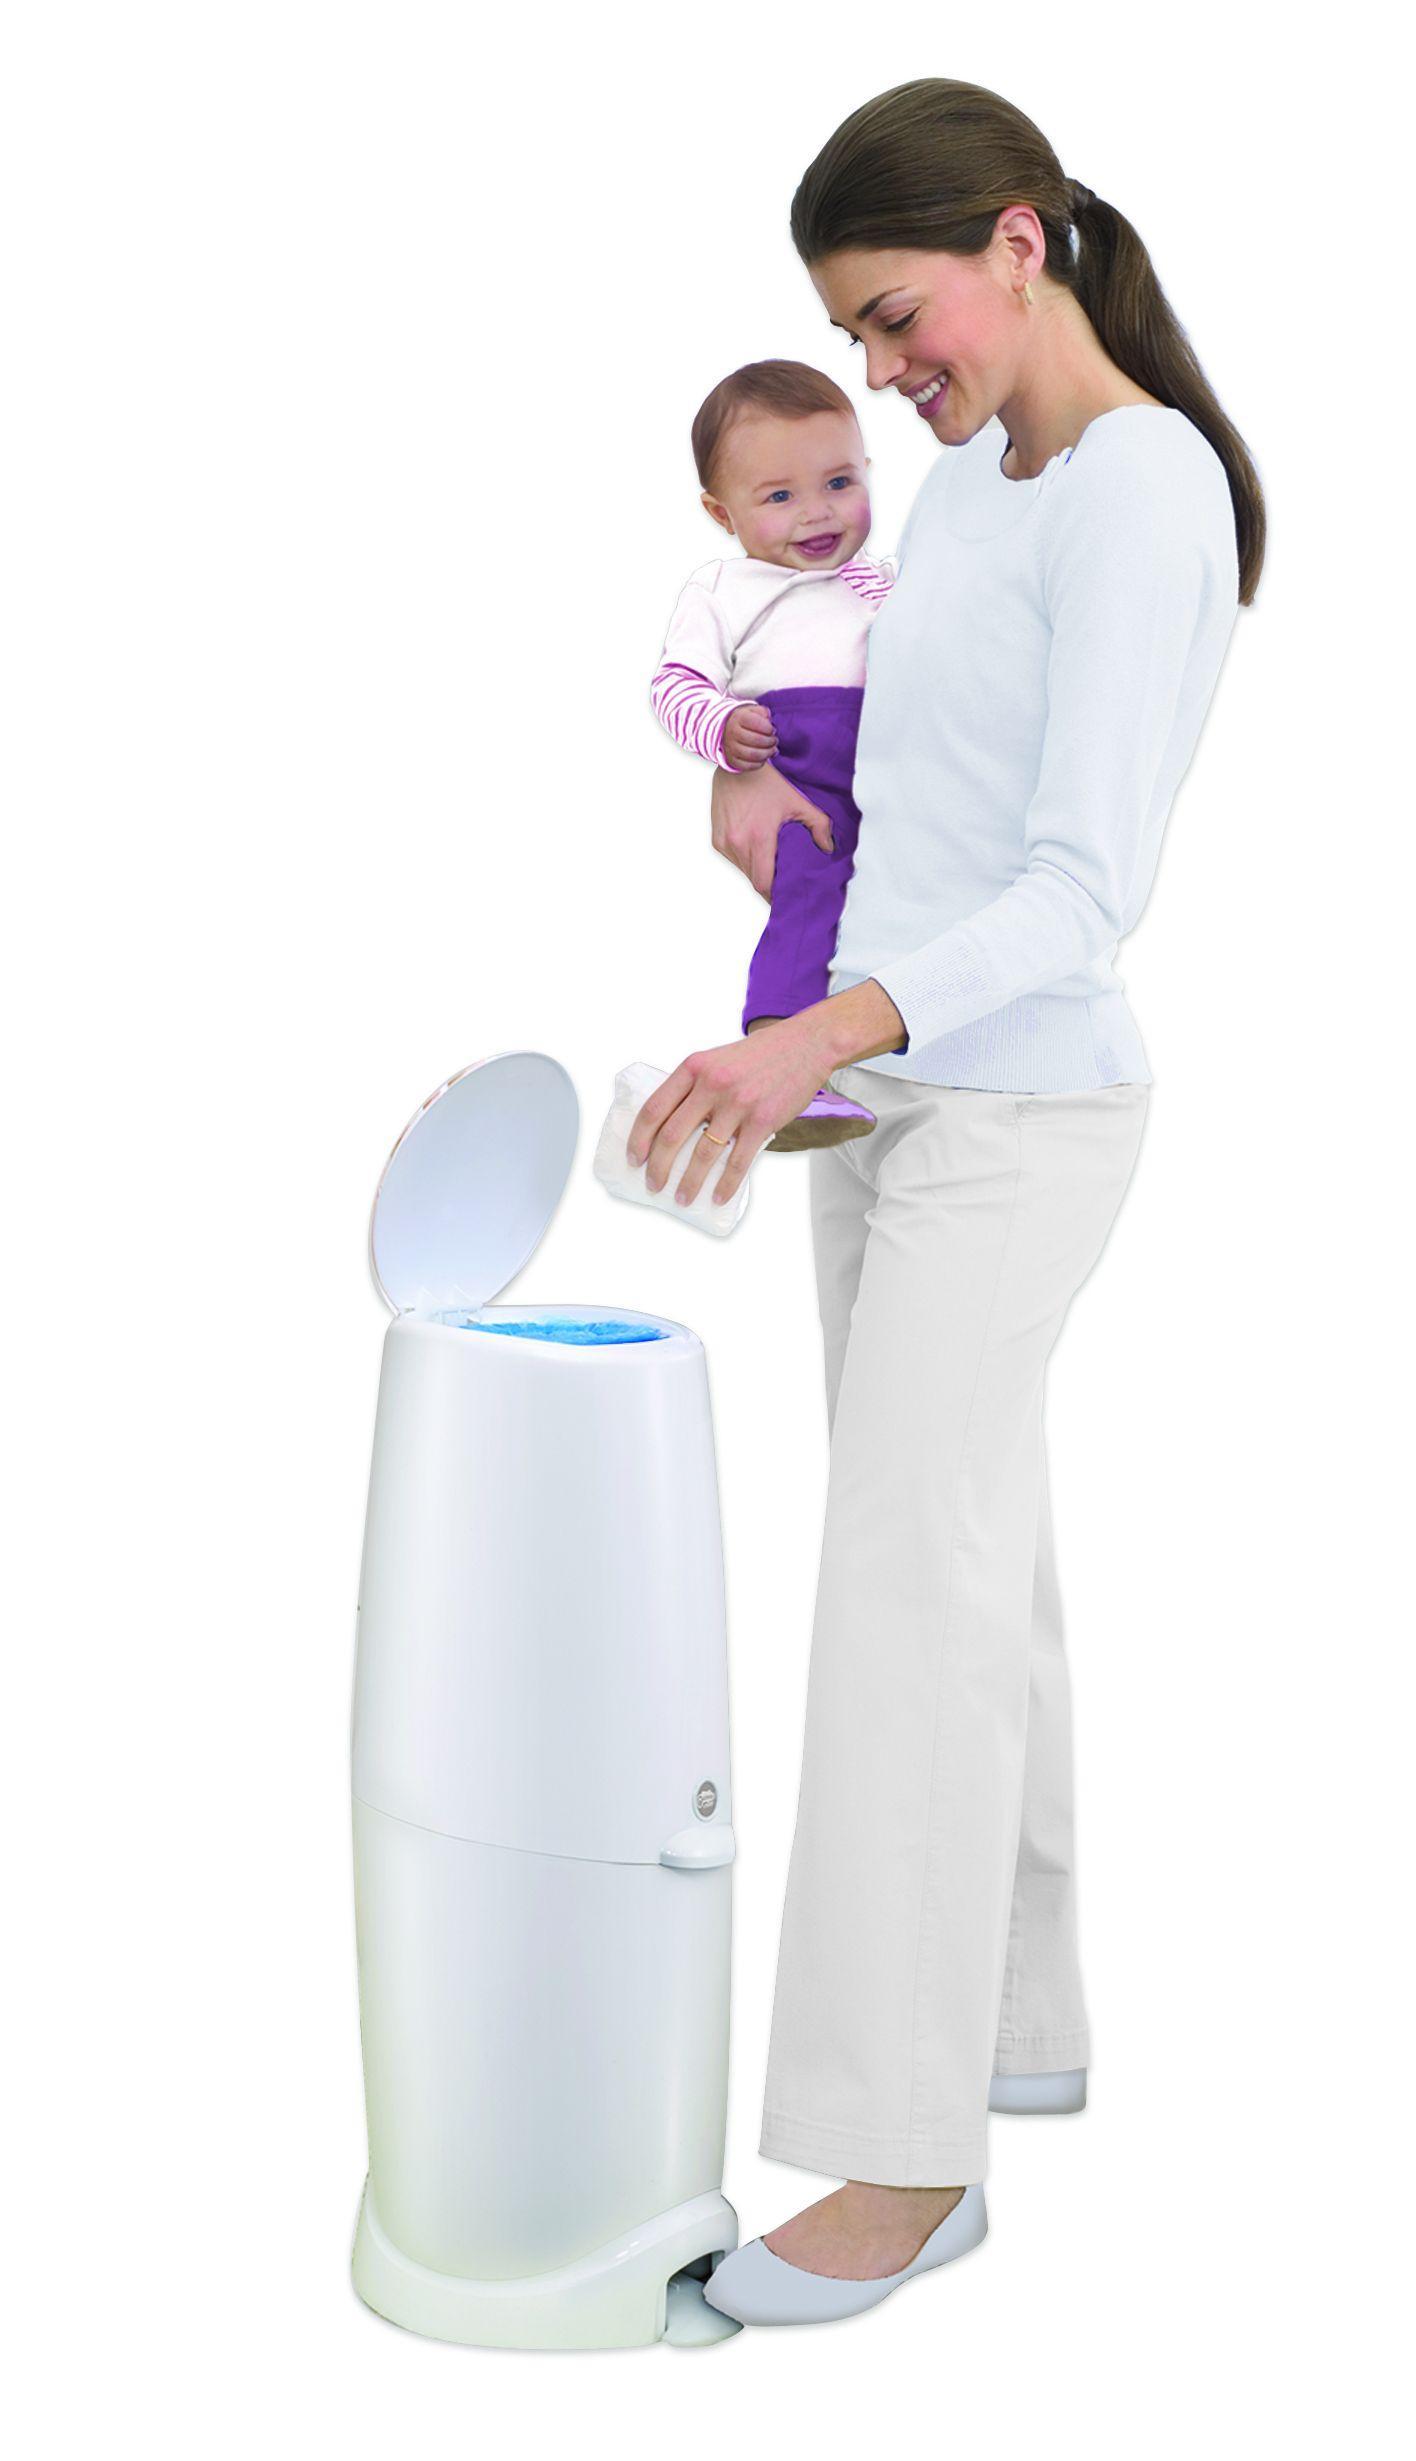 Amazon.com: Playtex Genie Elite Pail System Diaper with